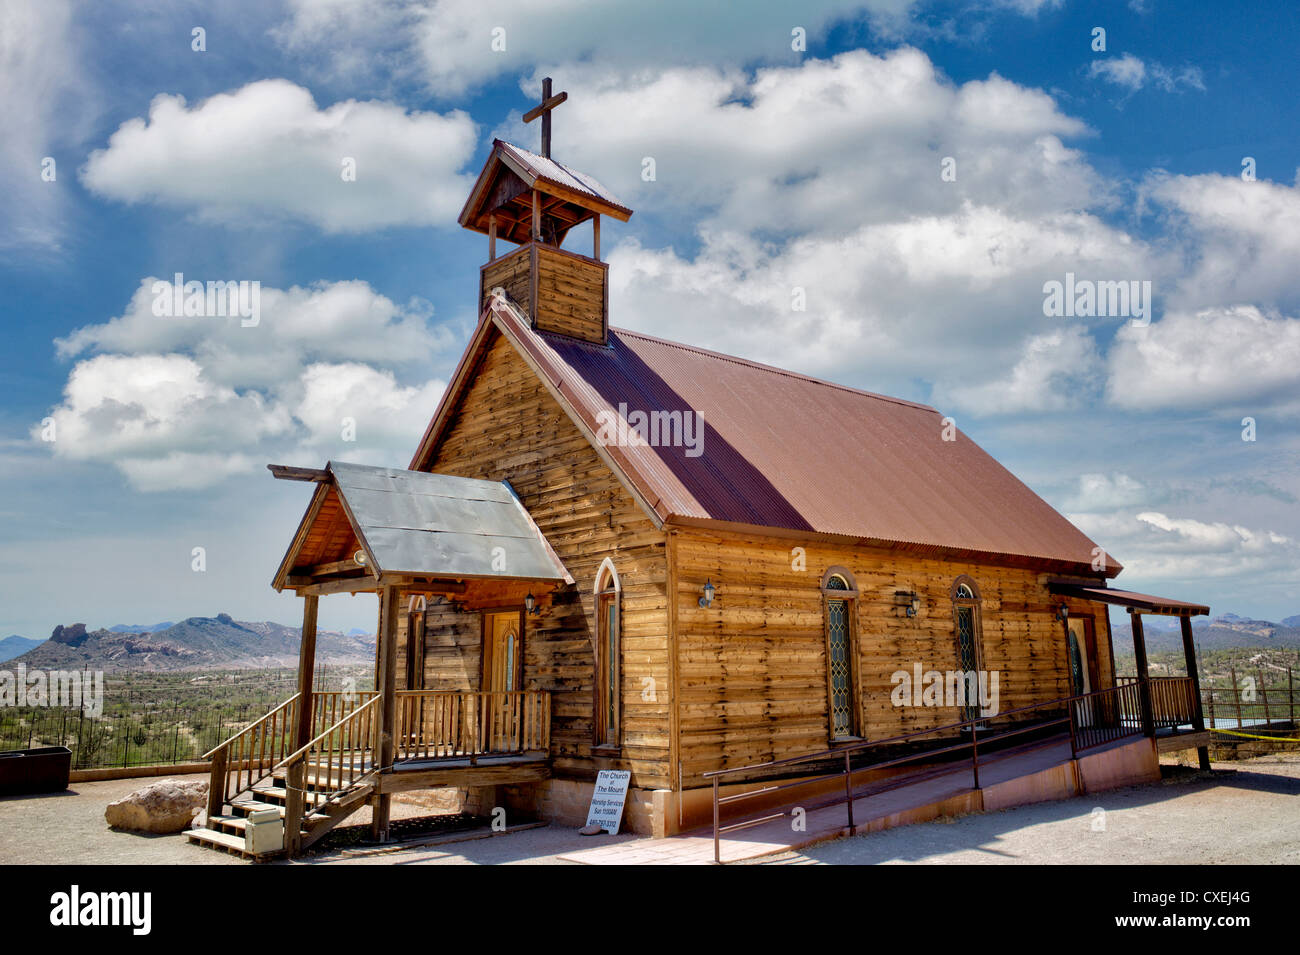 New Testament Christian Church. Goldfield ghost town, Arizona. - Stock Image